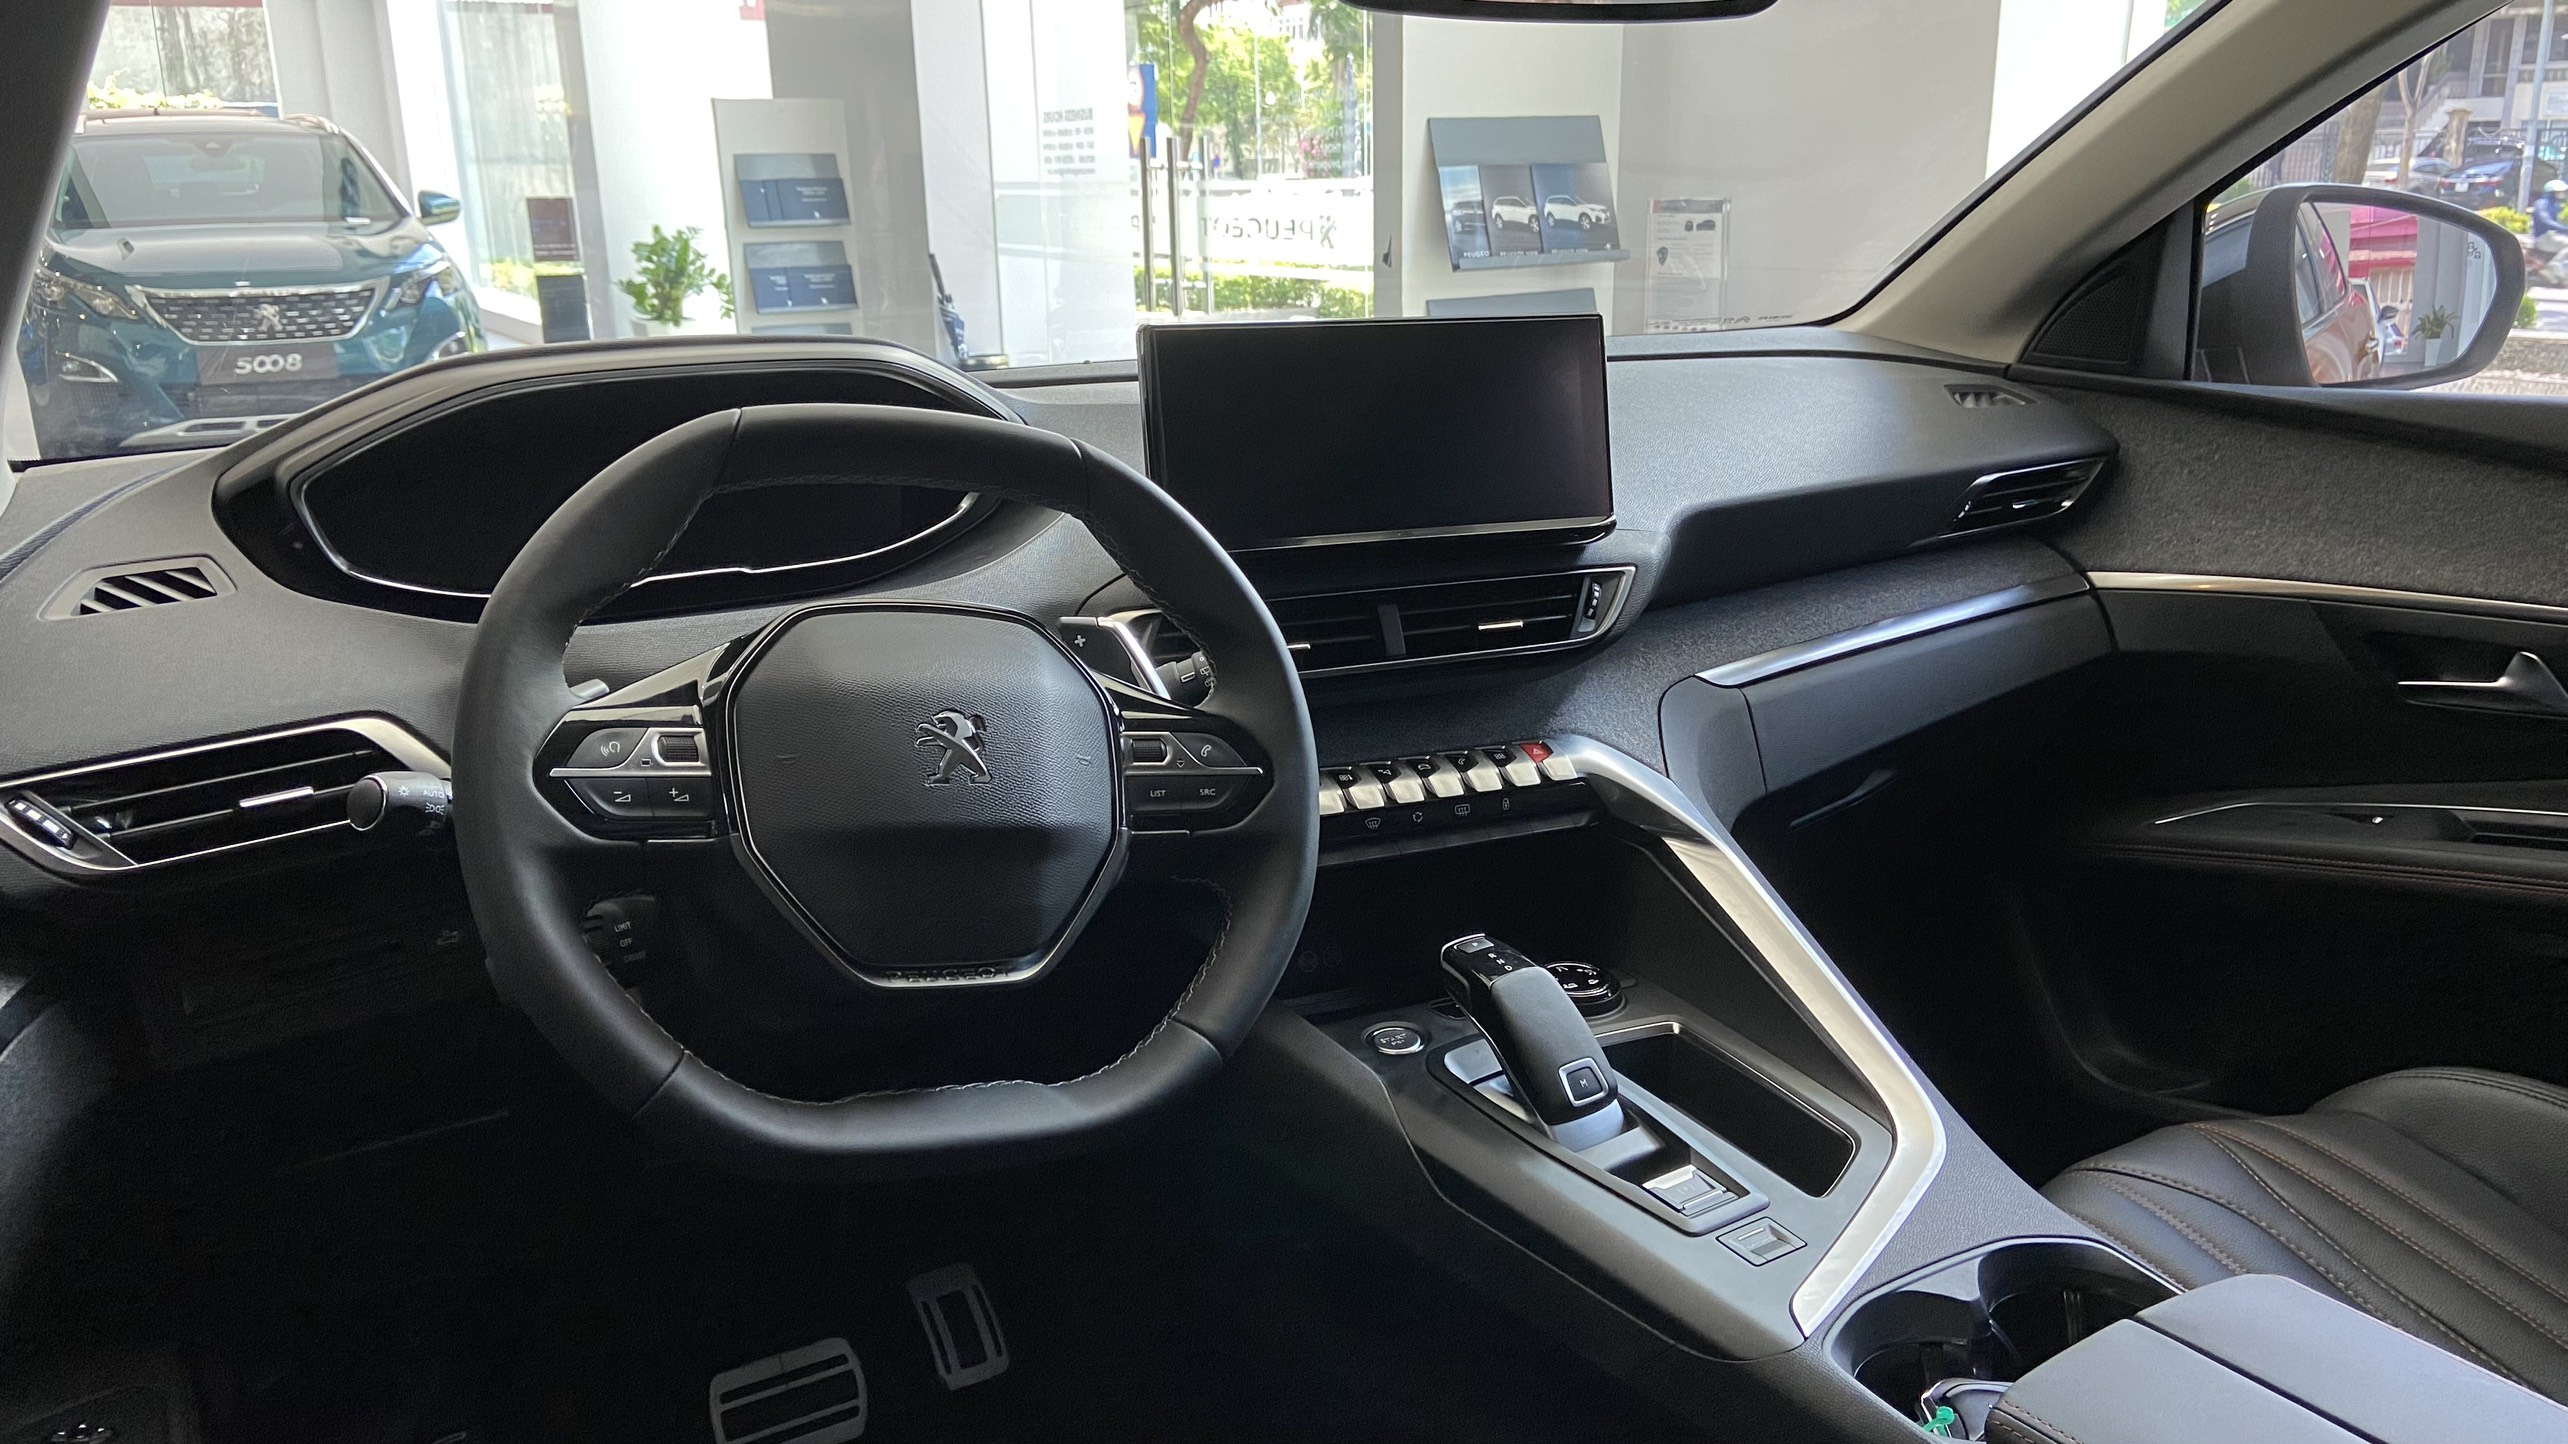 so sanh Peugeot 3008 va Honda CR-V anh 9